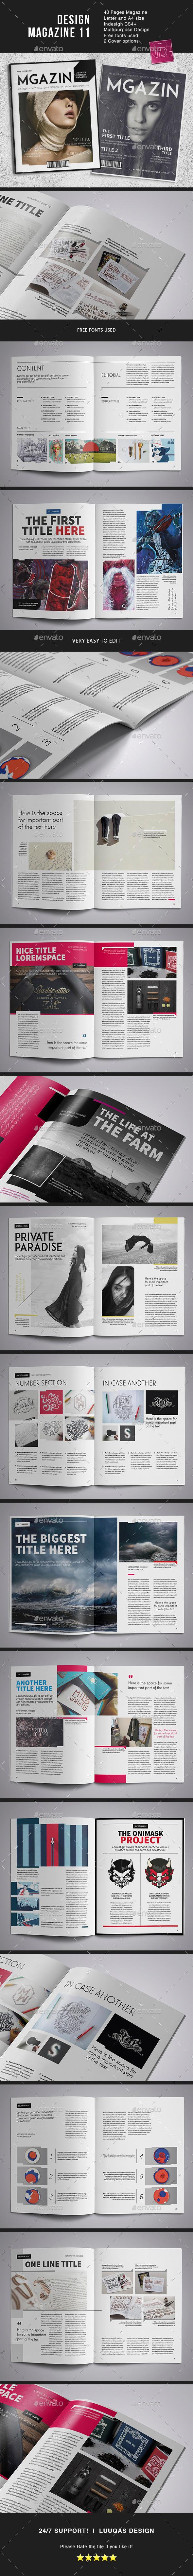 Design Magazine 11 Template - Magazines Print Templates